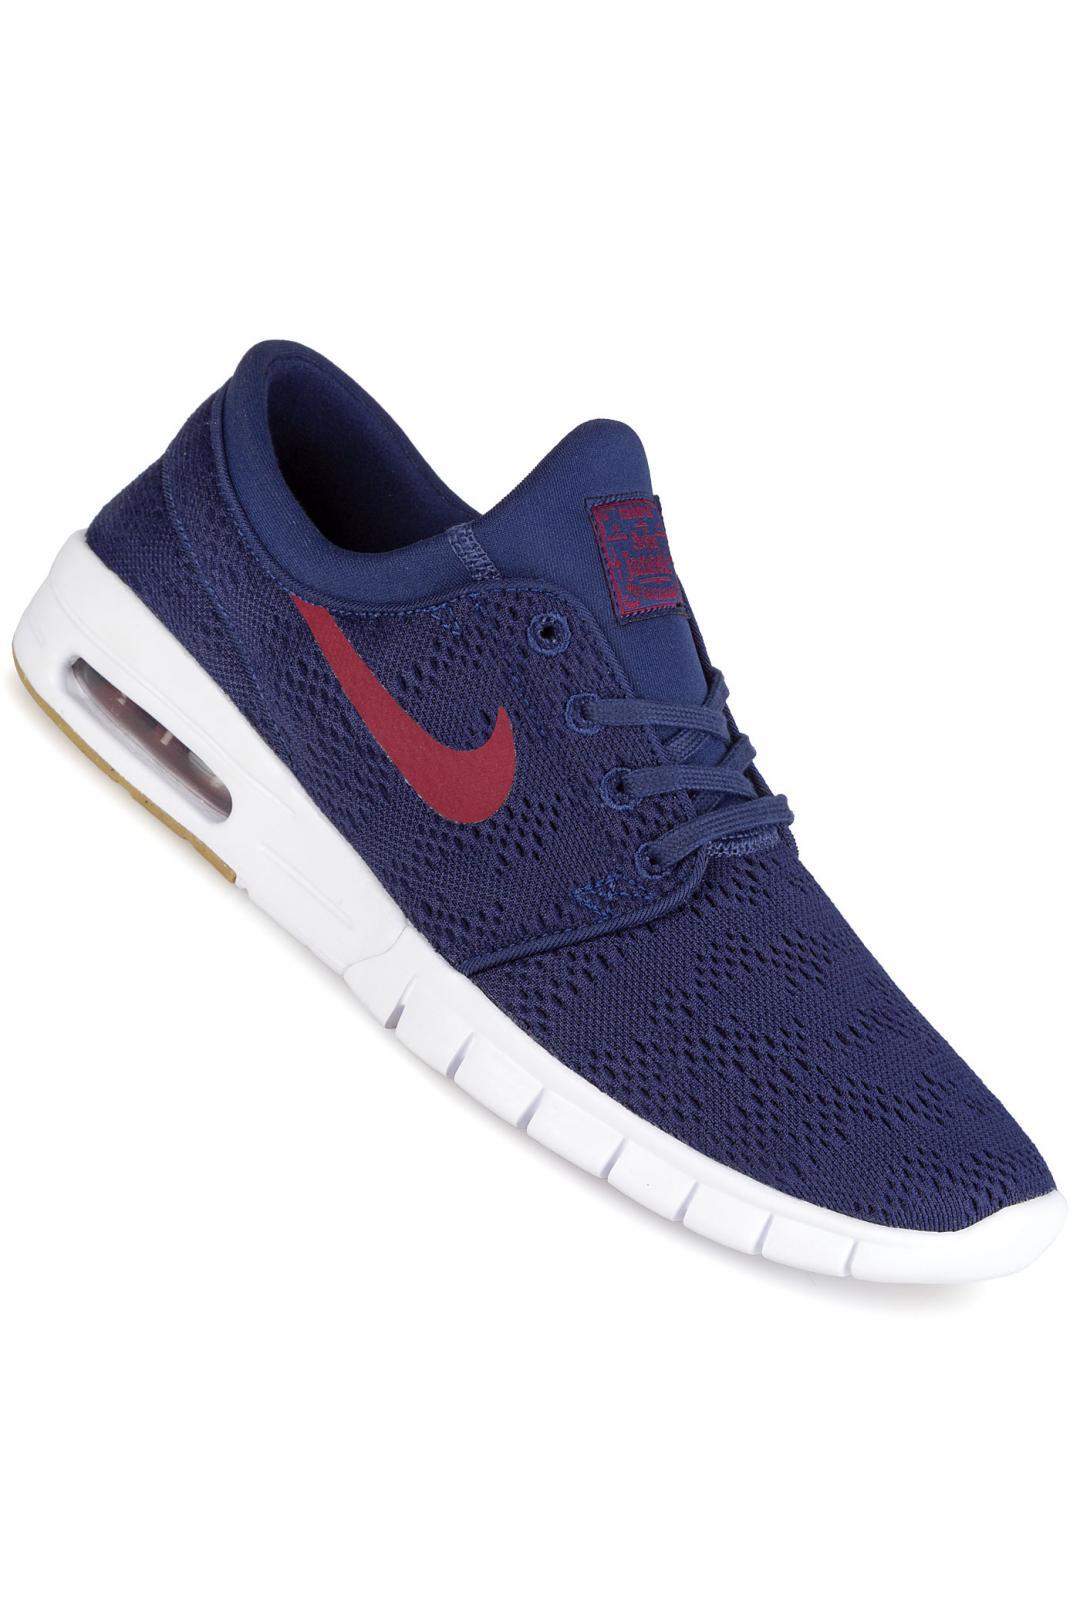 Uomo Nike SB Stefan Janoski Max binary blue team red | Sneakers low top